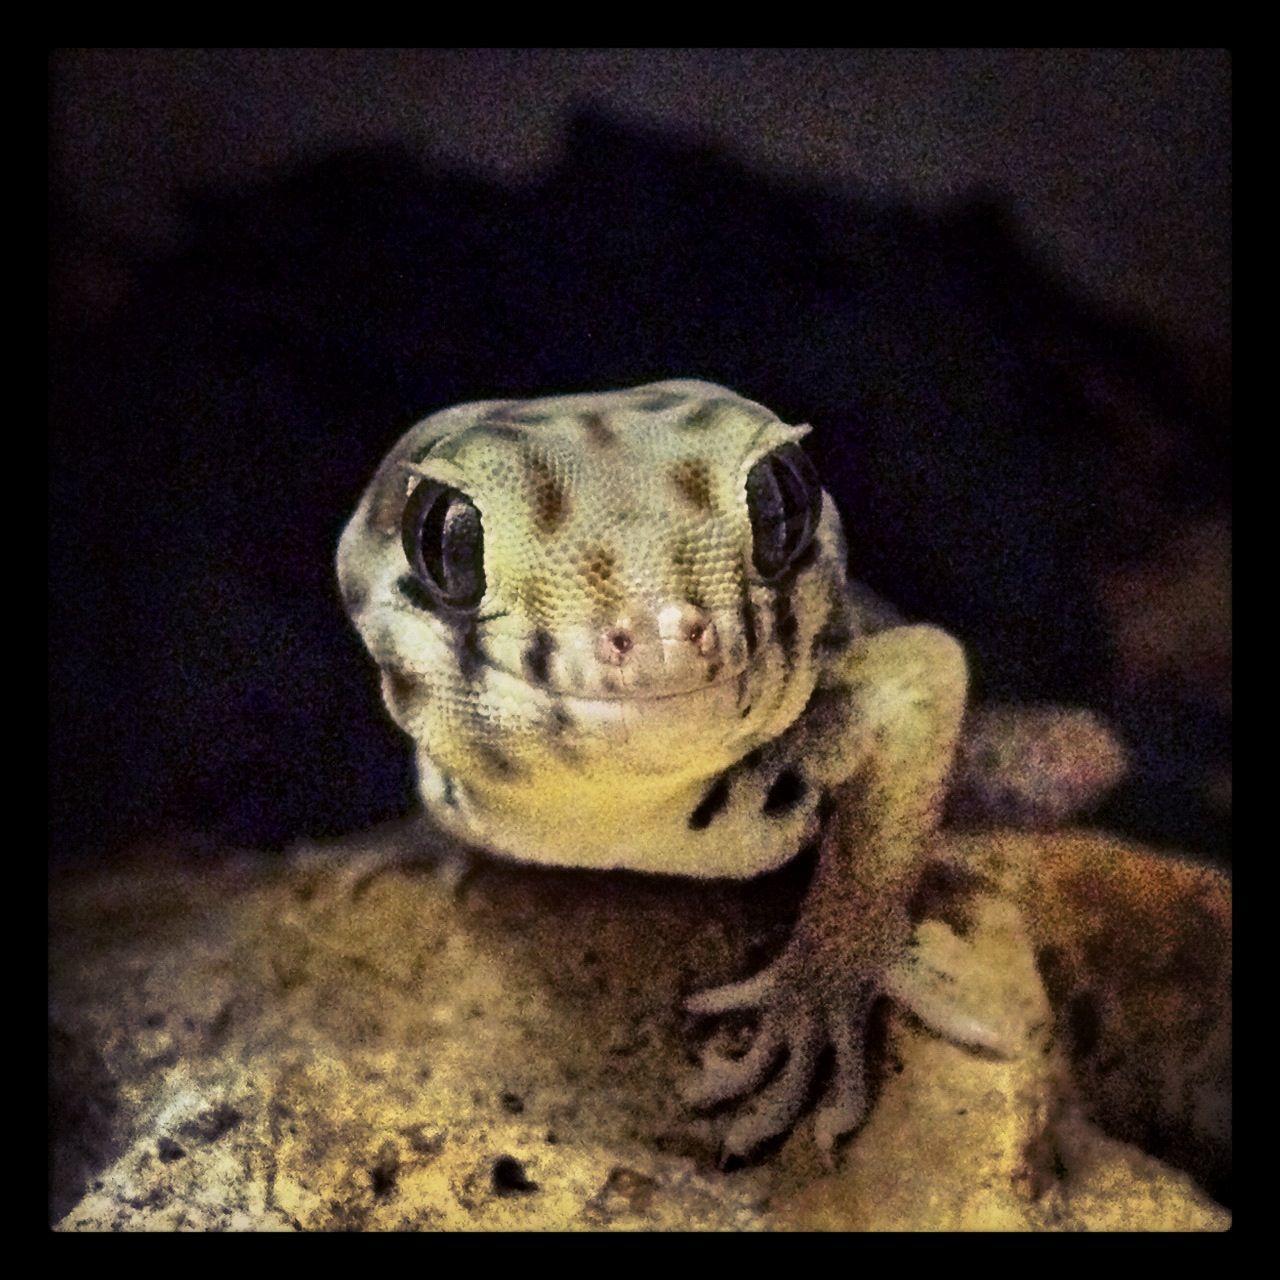 Frog Eyed Gecko With Images Amphibians